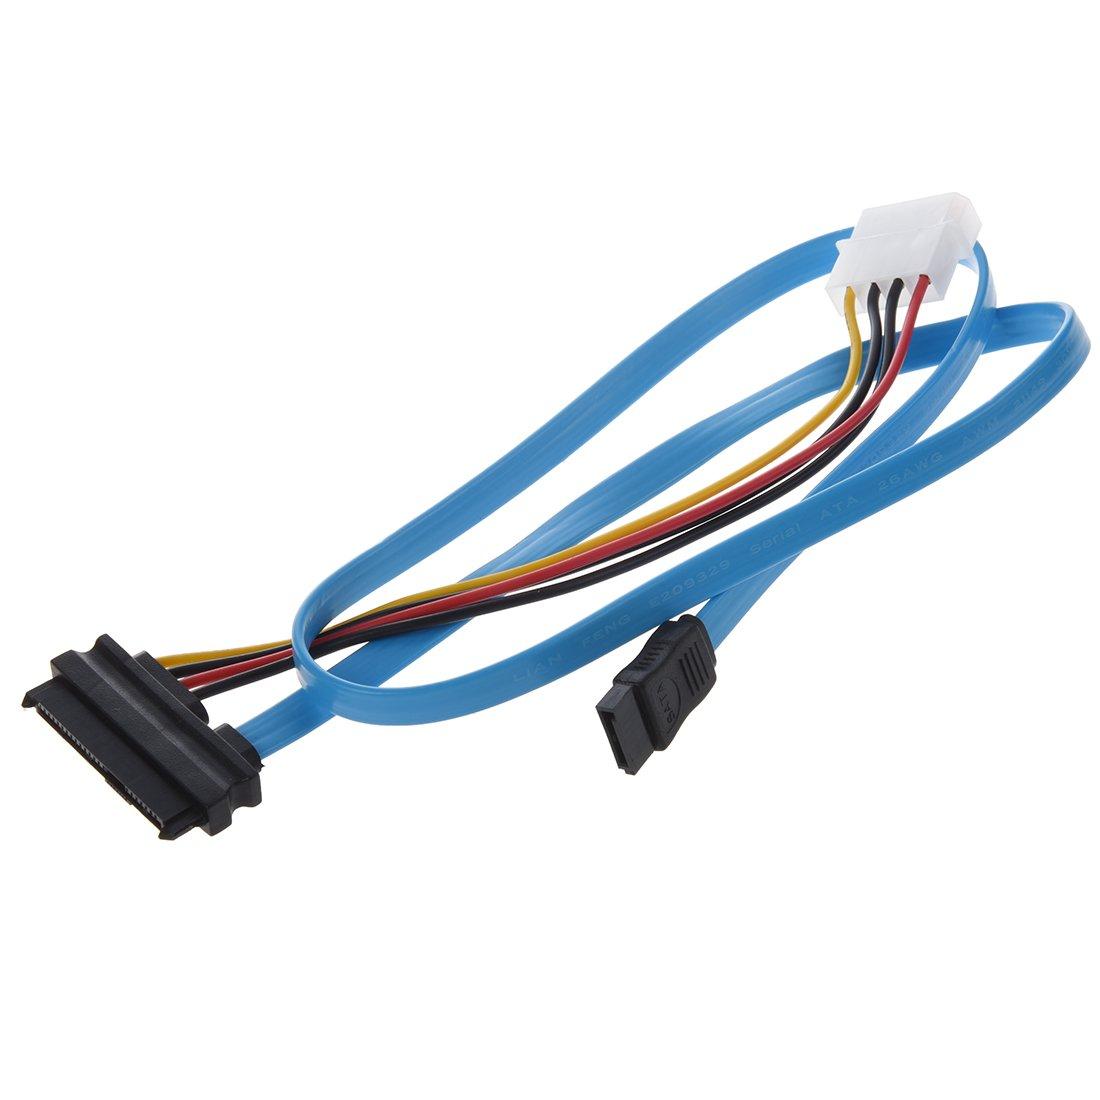 Amazon.com: TOOGOO(R) 7 Pin SATA to SAS 29 Pin & 4 Pin Connector ...